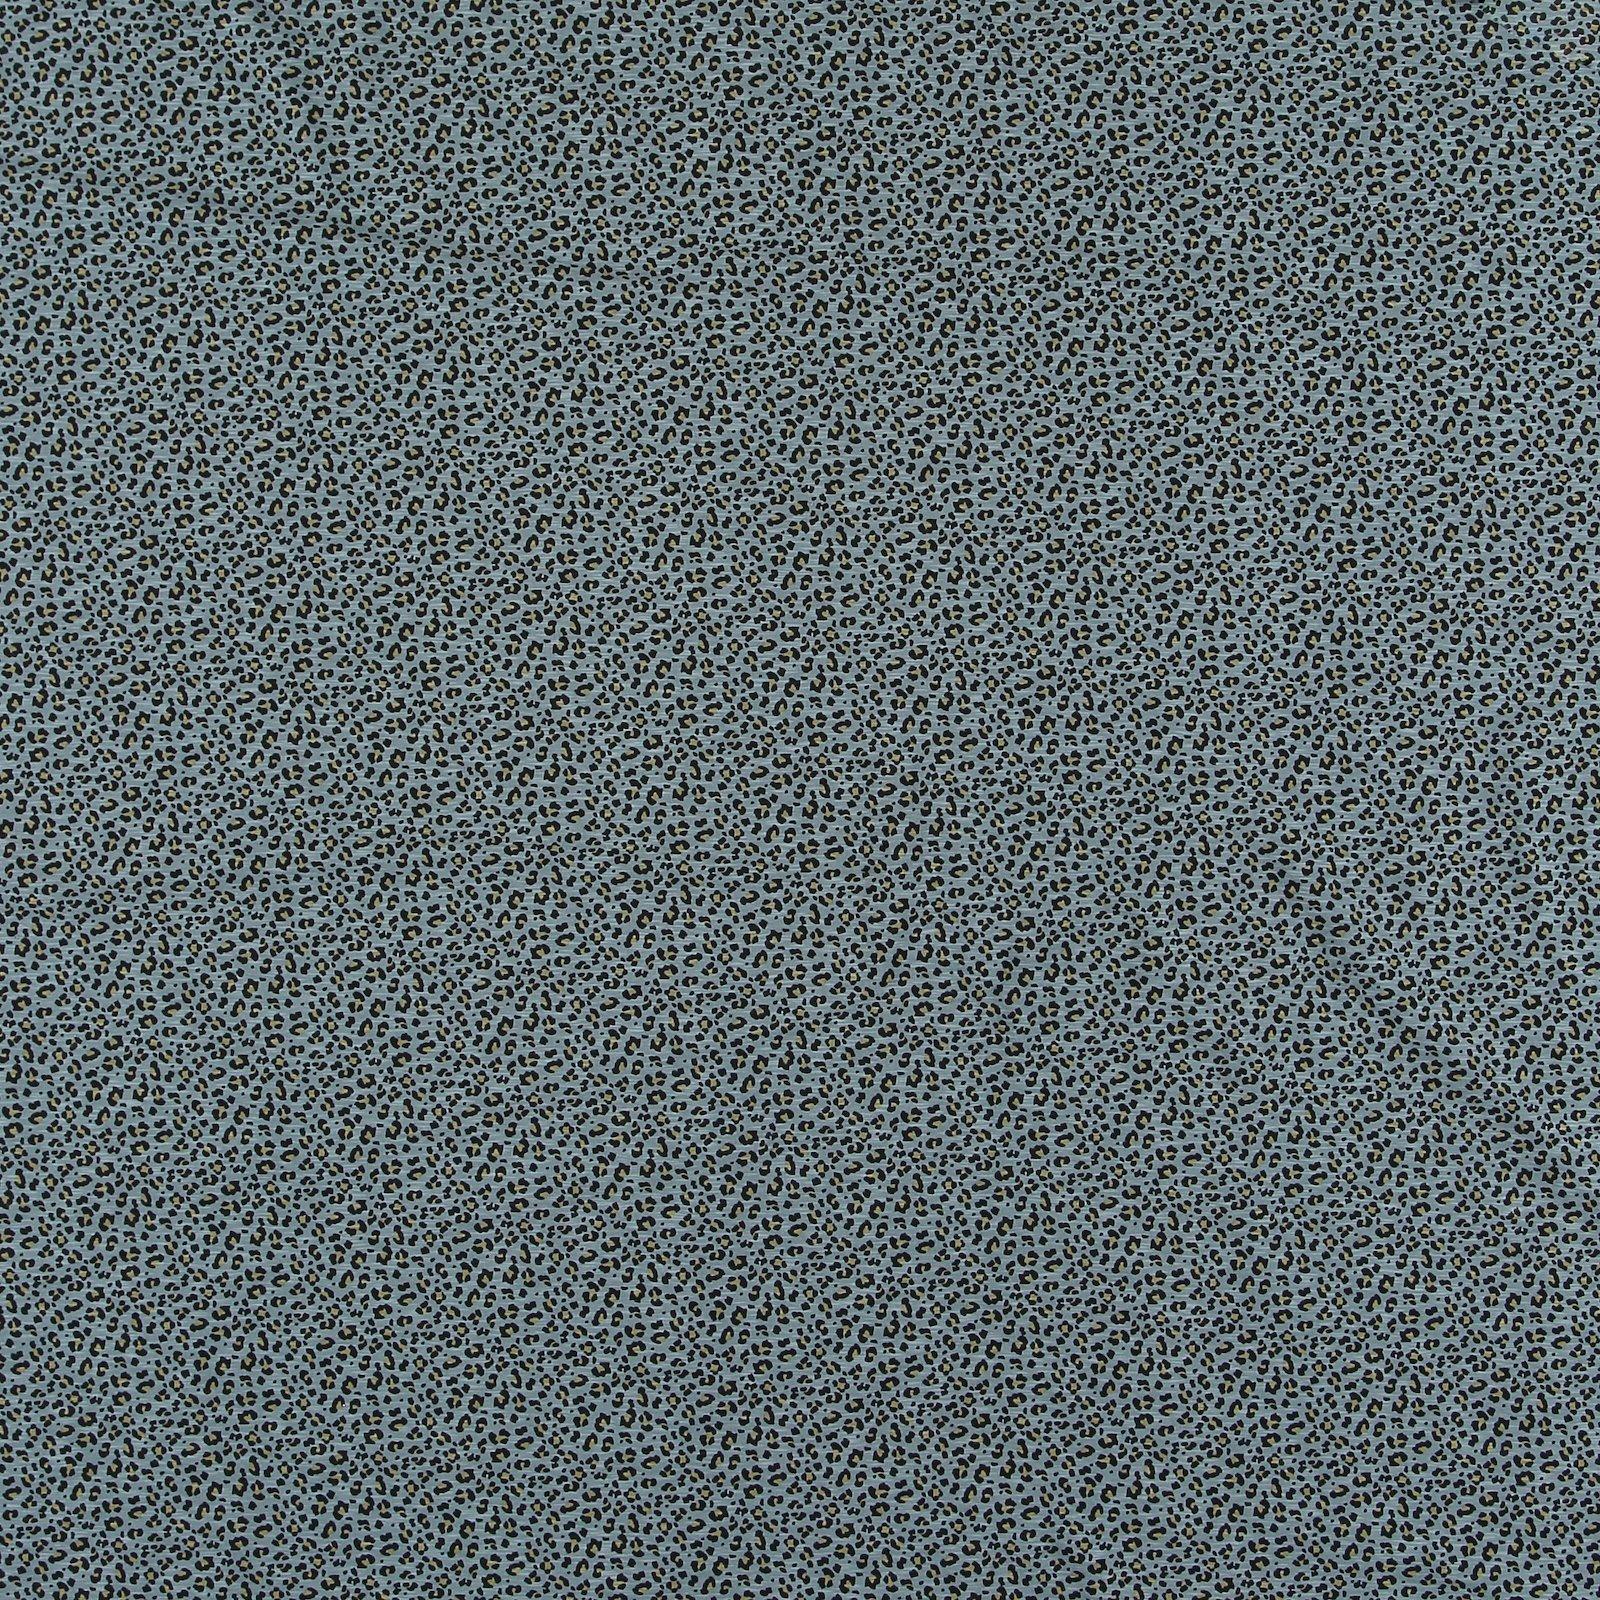 Organic slub st jersey blue grey w leo 272788_pack_sp